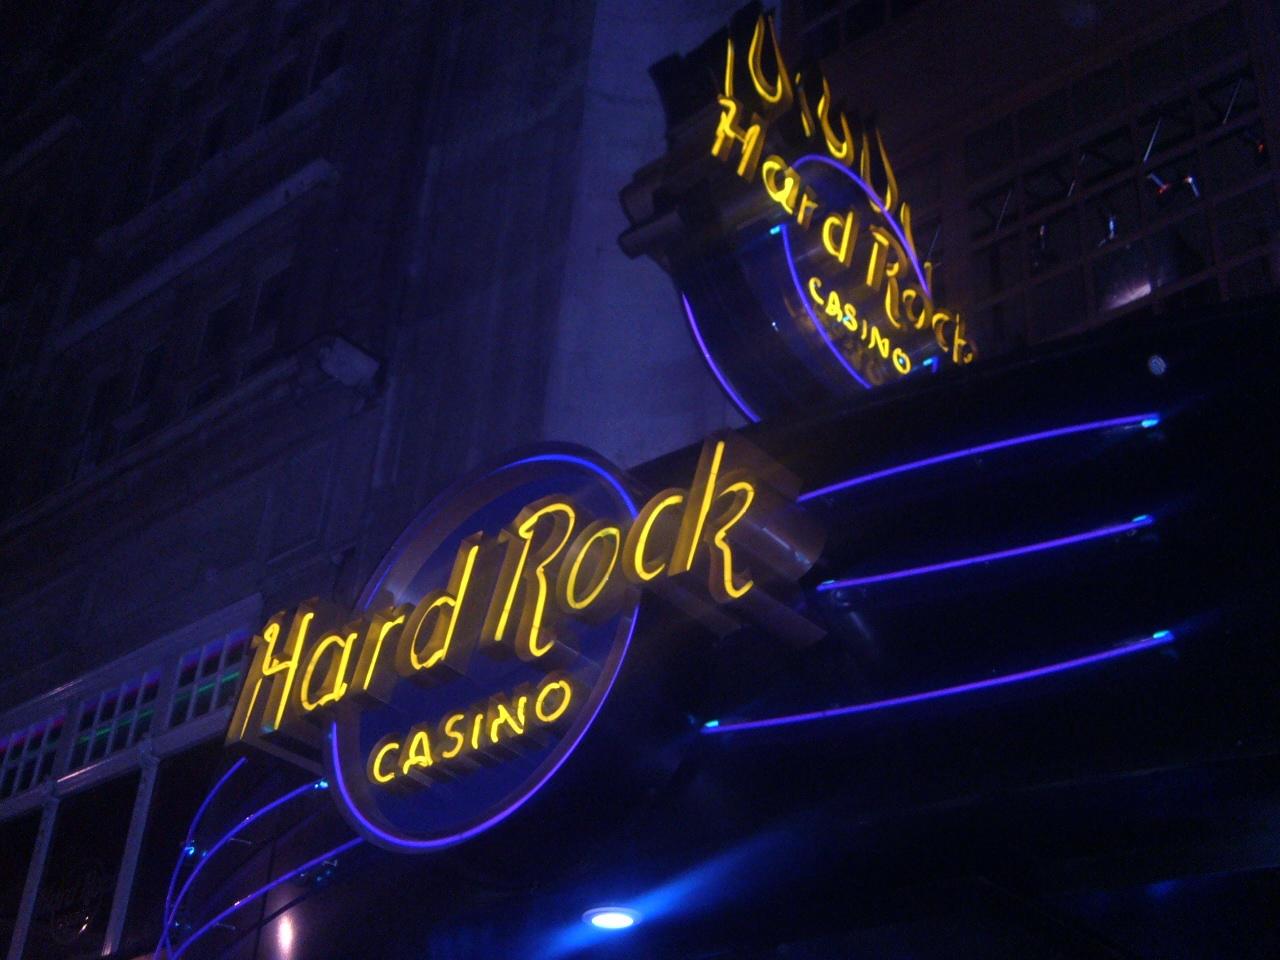 hard rock casino london